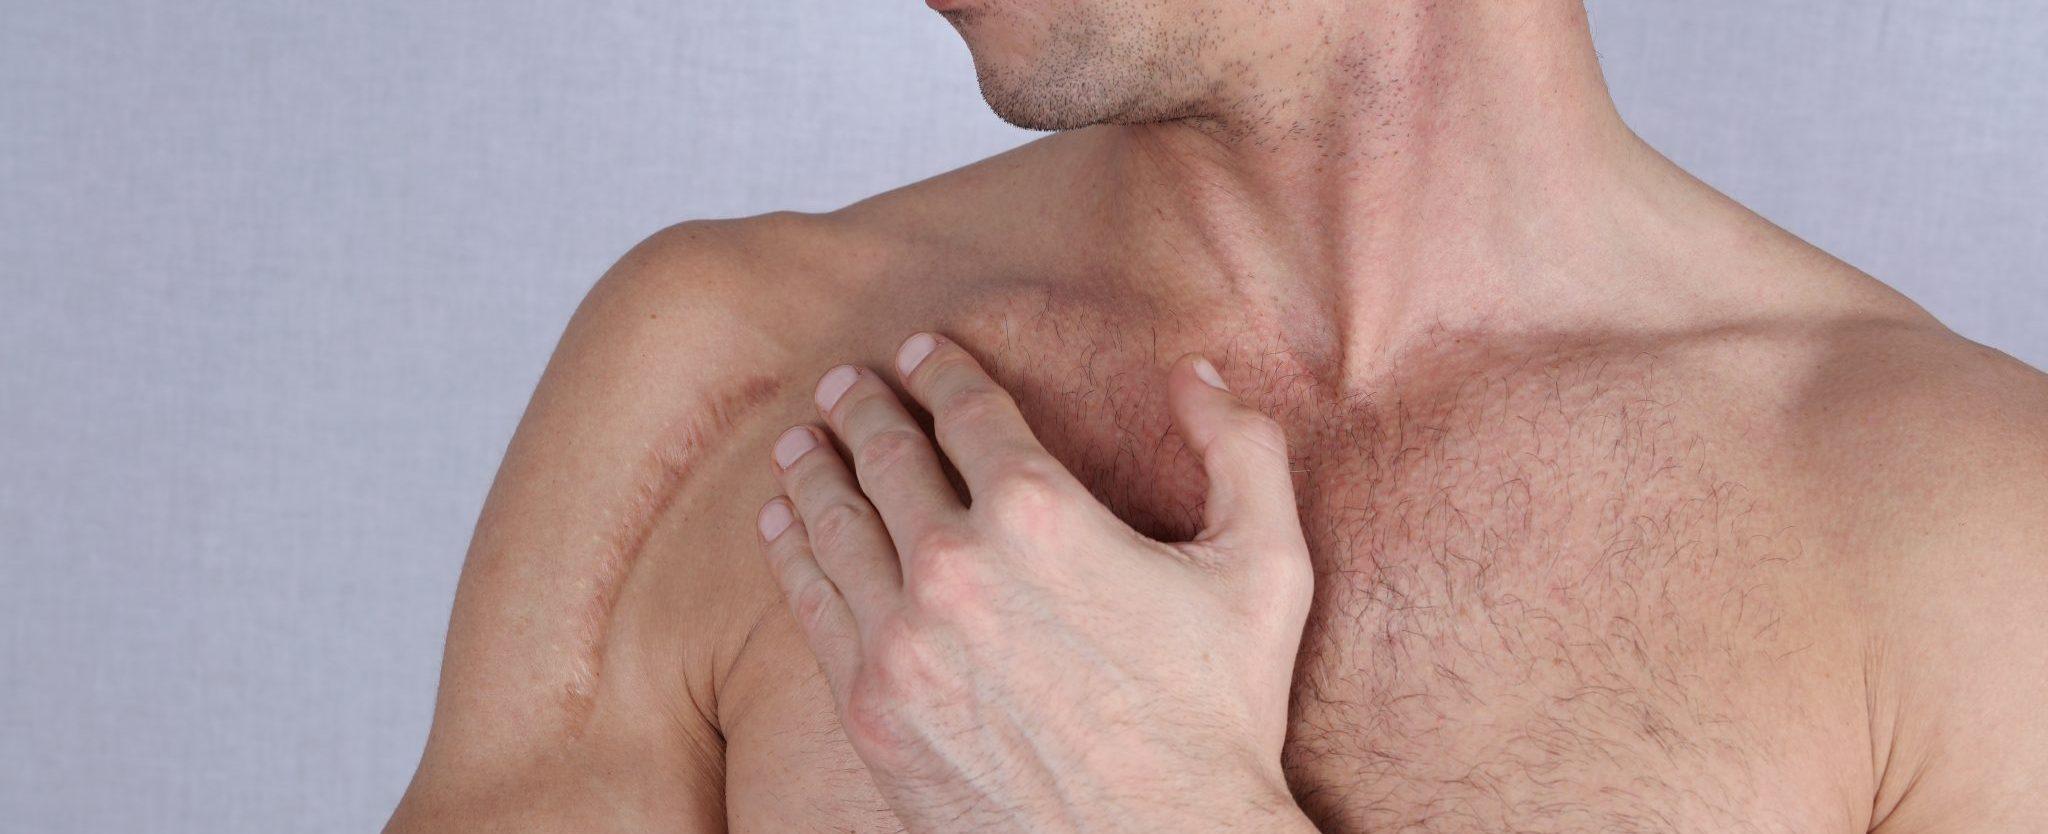 Man man with scar on his shoulder. Laser Scar Reduction concept